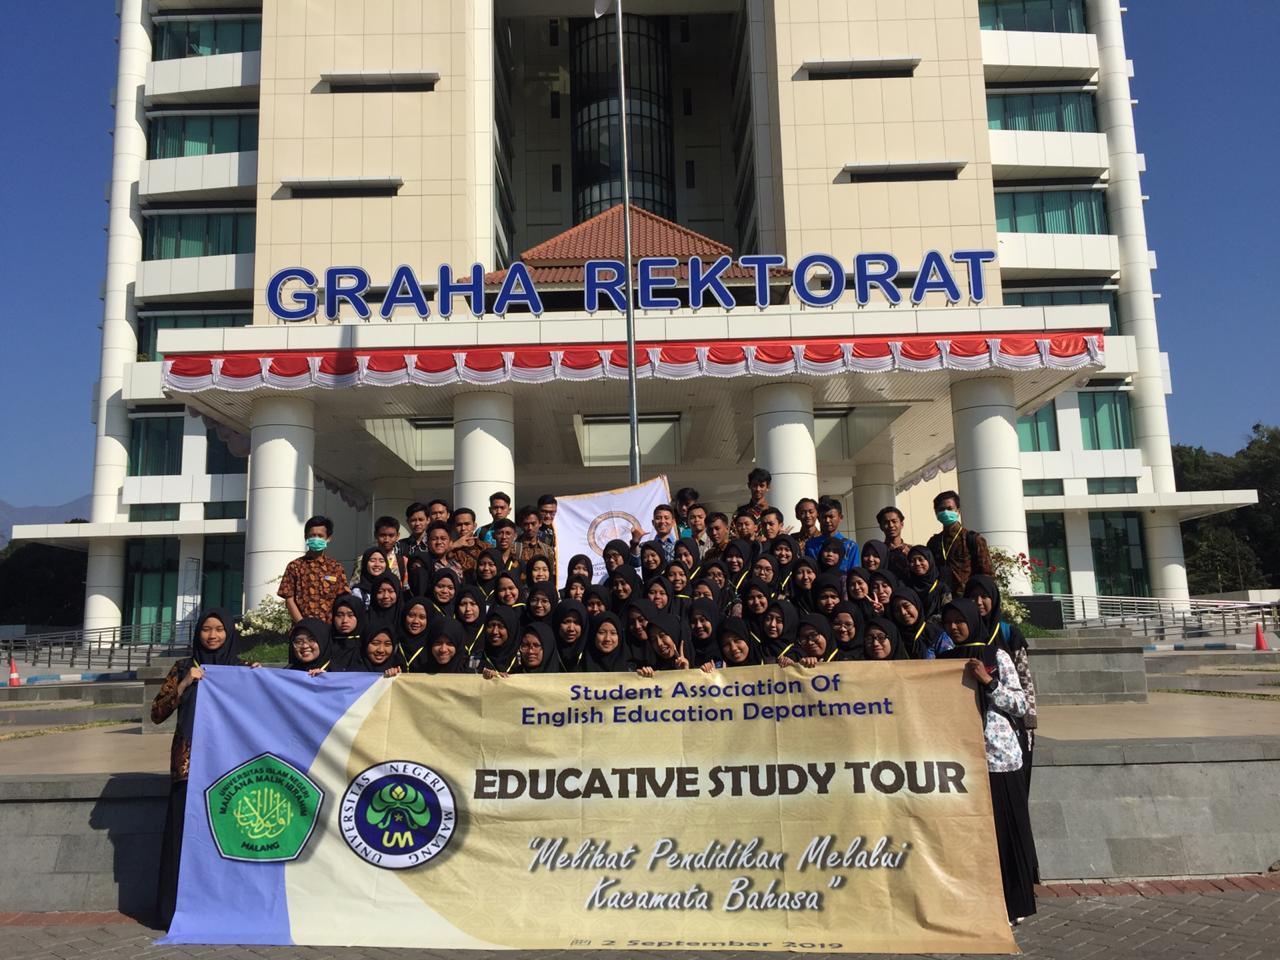 Educative Study Tour